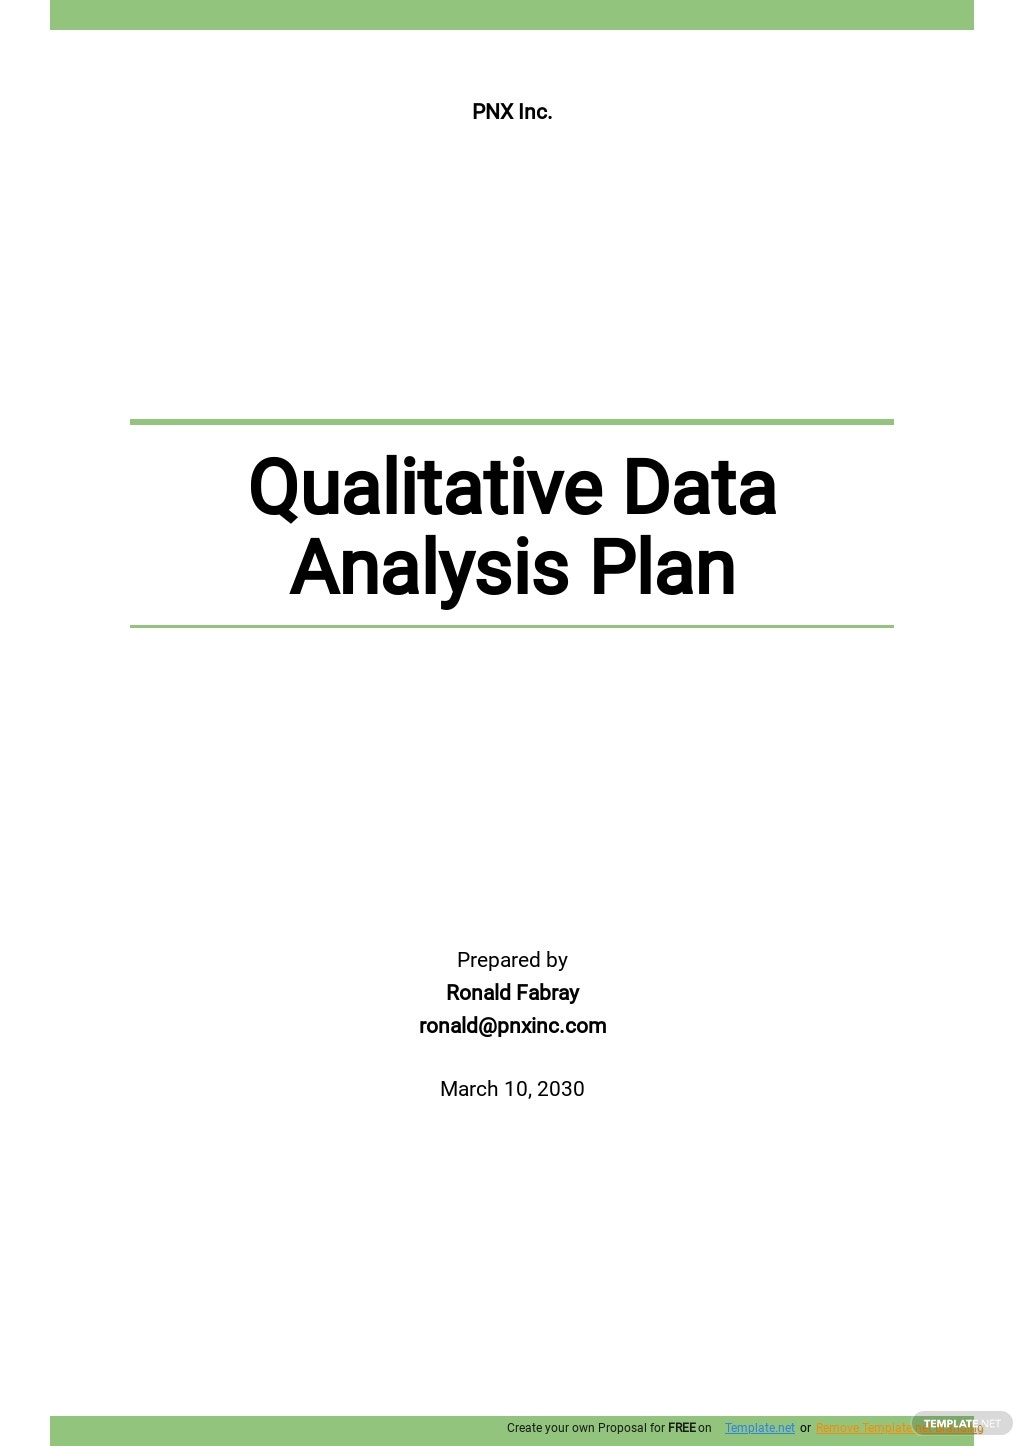 Qualitative Data Analysis Plan Template.jpe